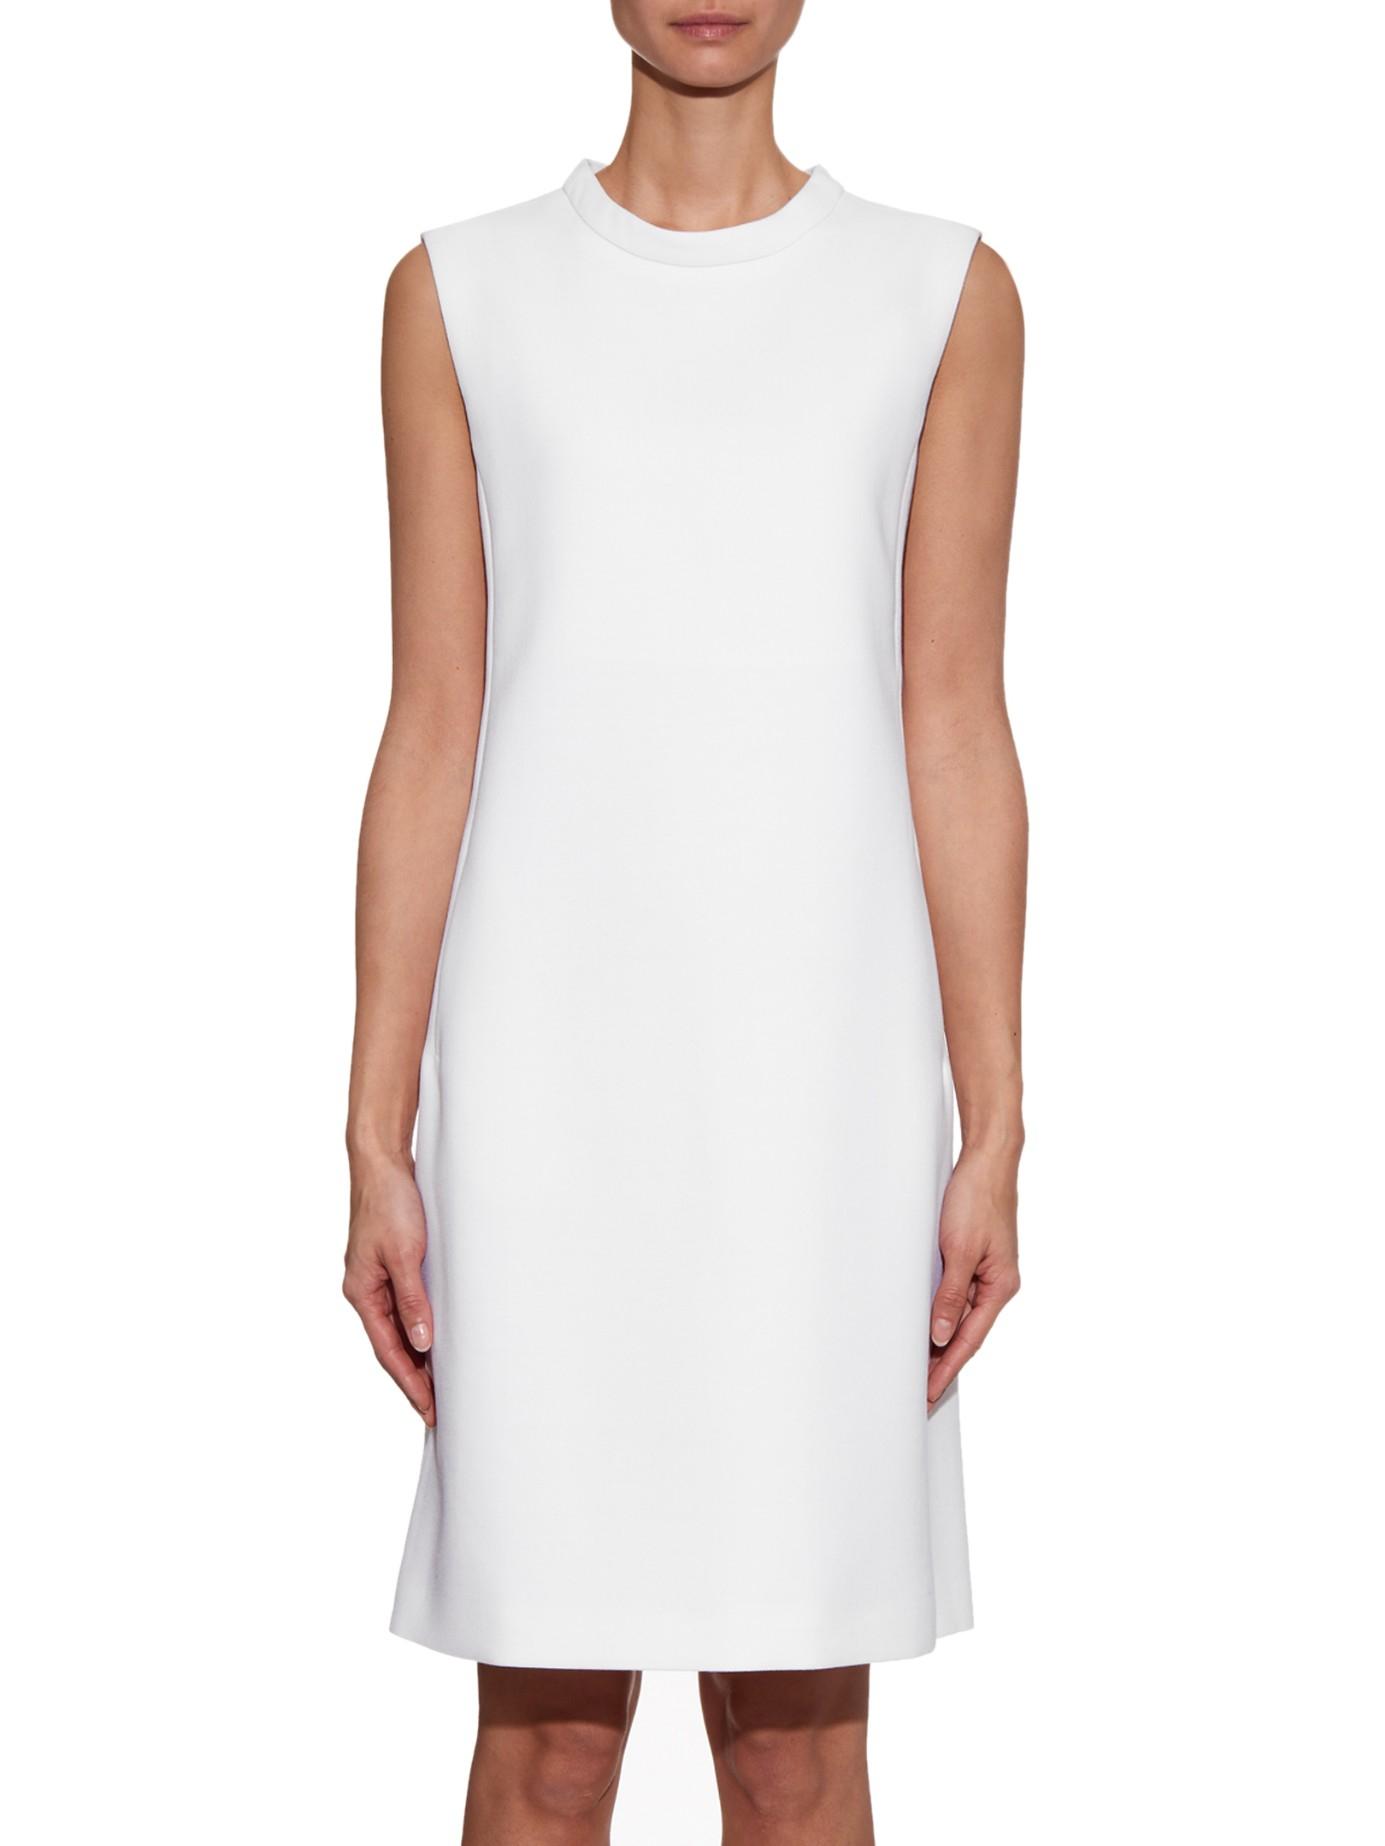 S Max Mara Vicini Dress in White - Lyst